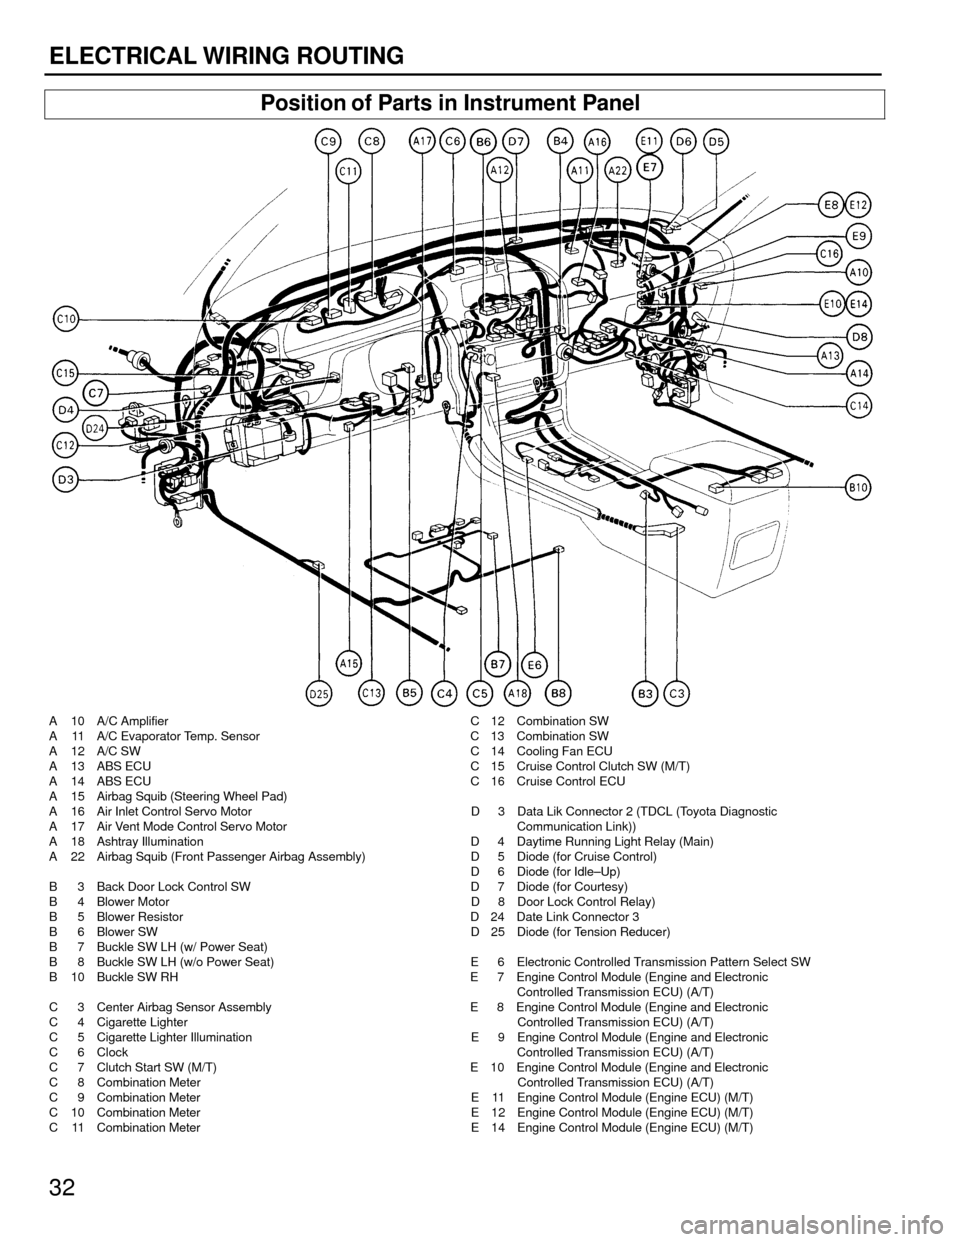 TOYOTA CAMRY 1994 XV10 / 4.G Wiring Diagrams Workshop Manual